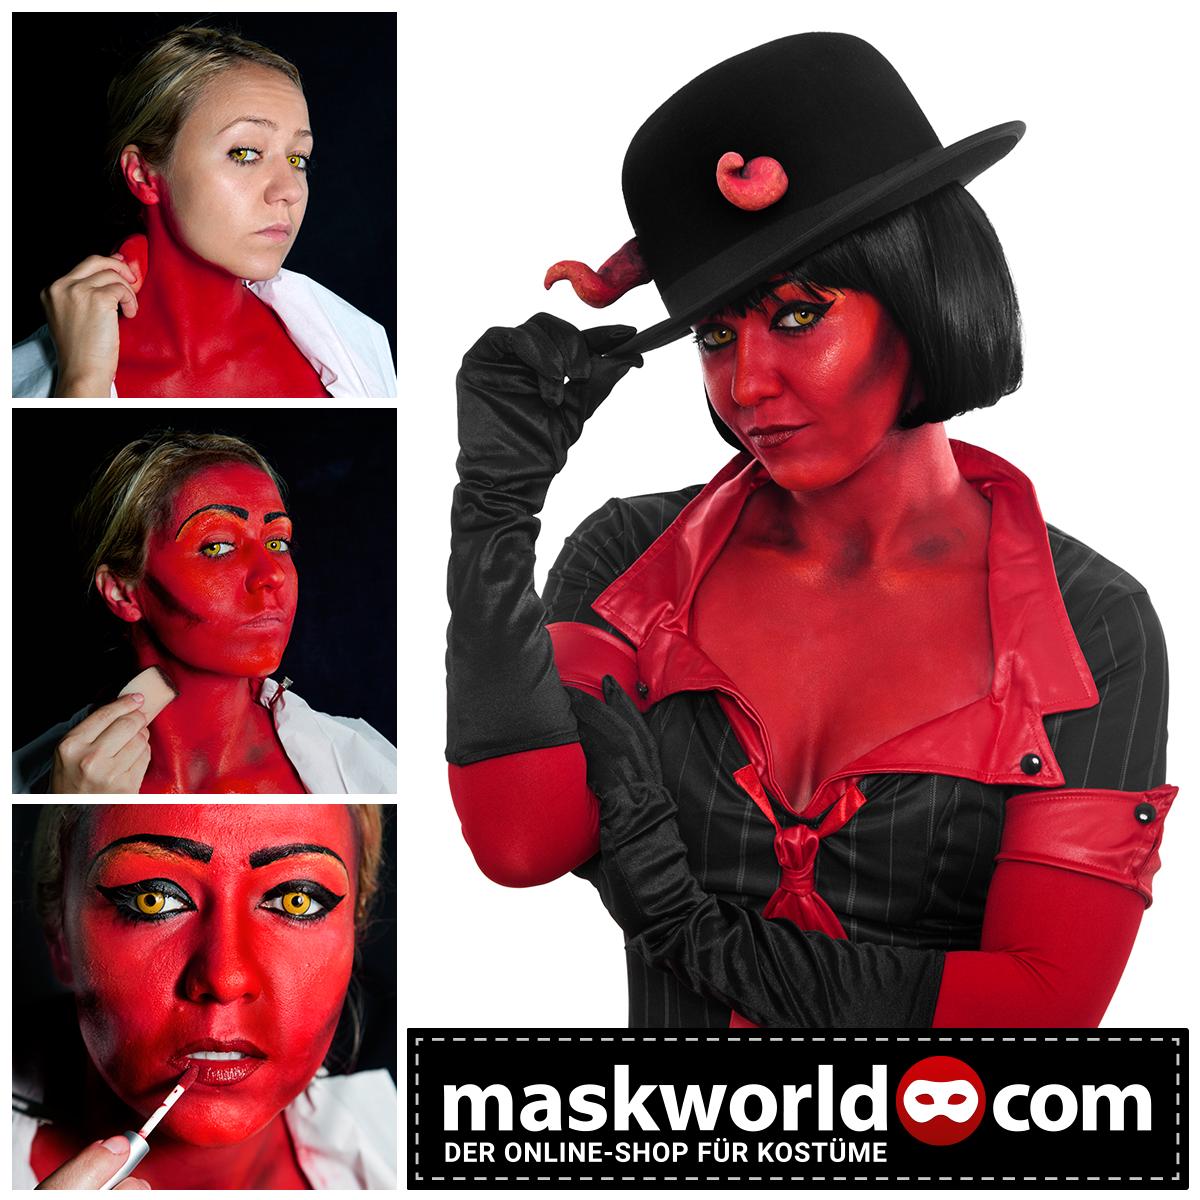 halloween horror makeup mua devil teufel devilwoman teufelin sexy red satan. Black Bedroom Furniture Sets. Home Design Ideas